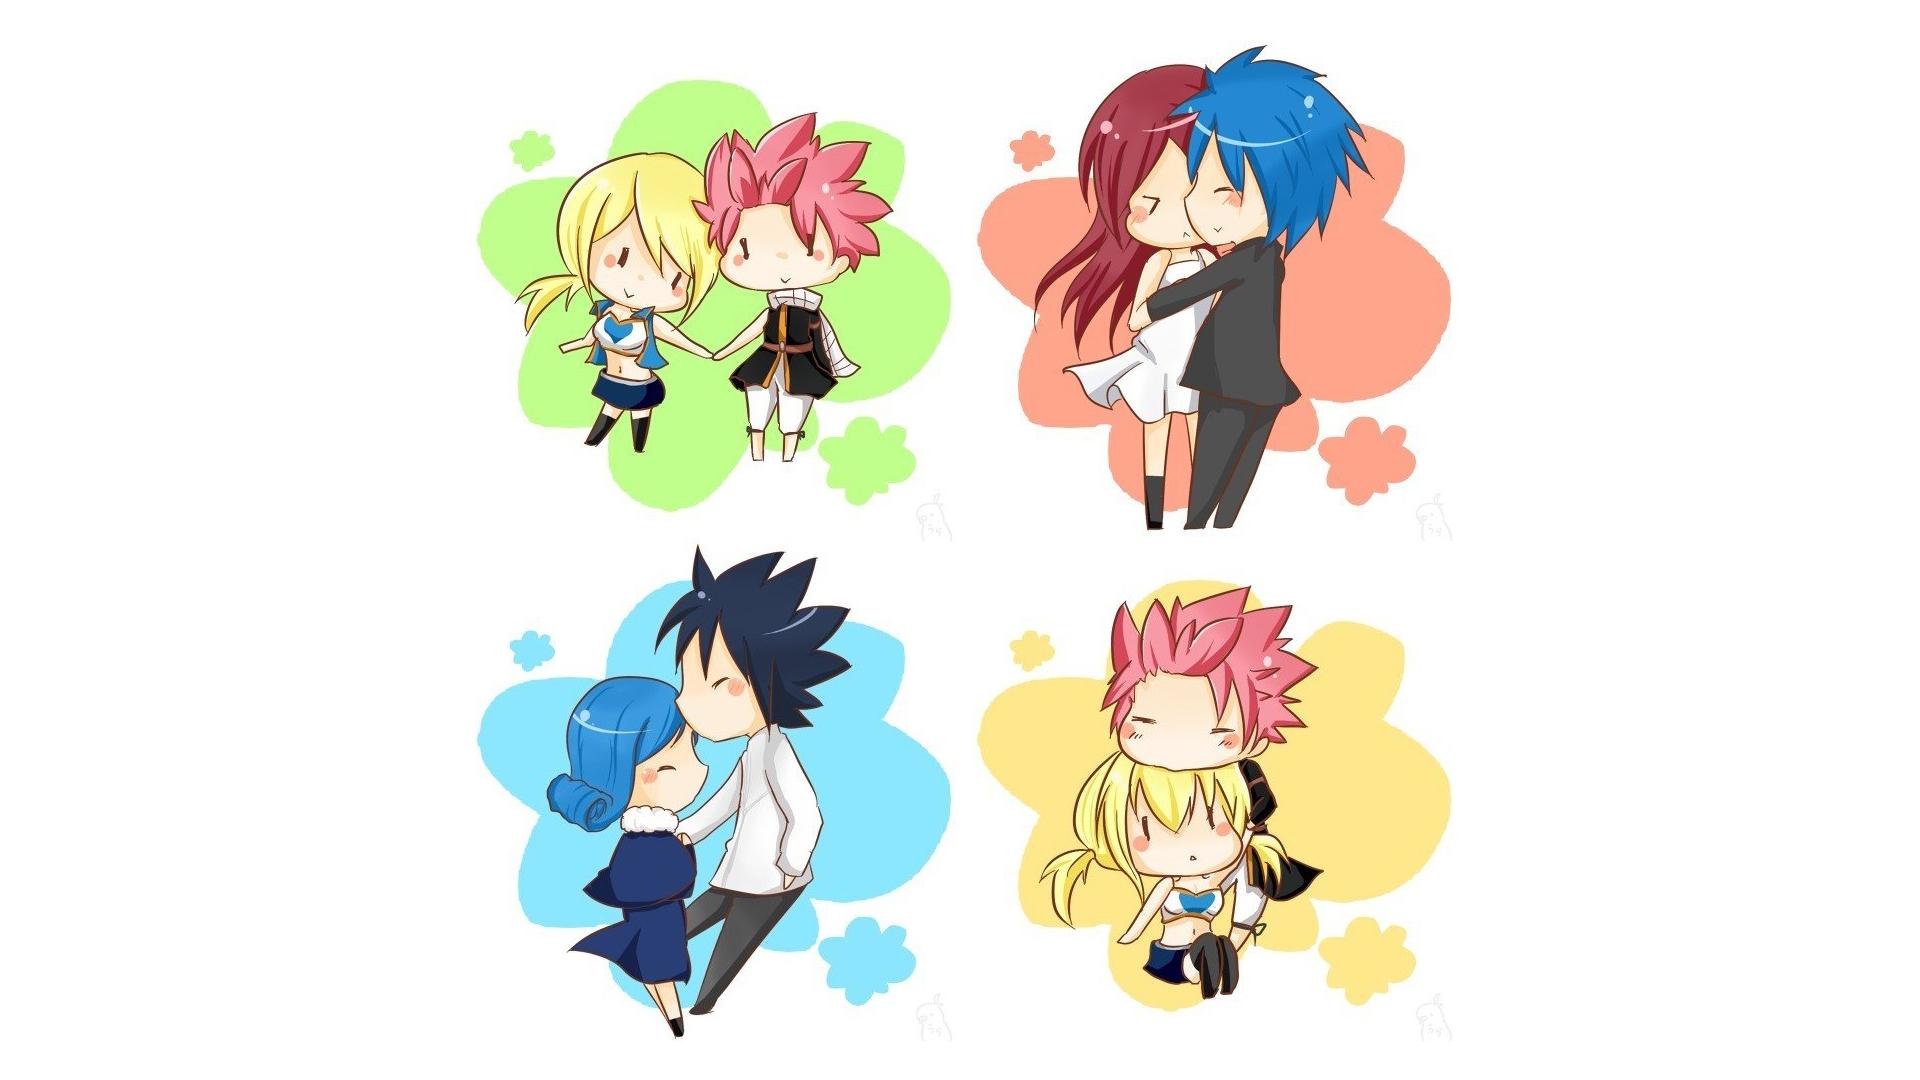 Anime Chibi Fairy Tail 02 Hd Wallpaper